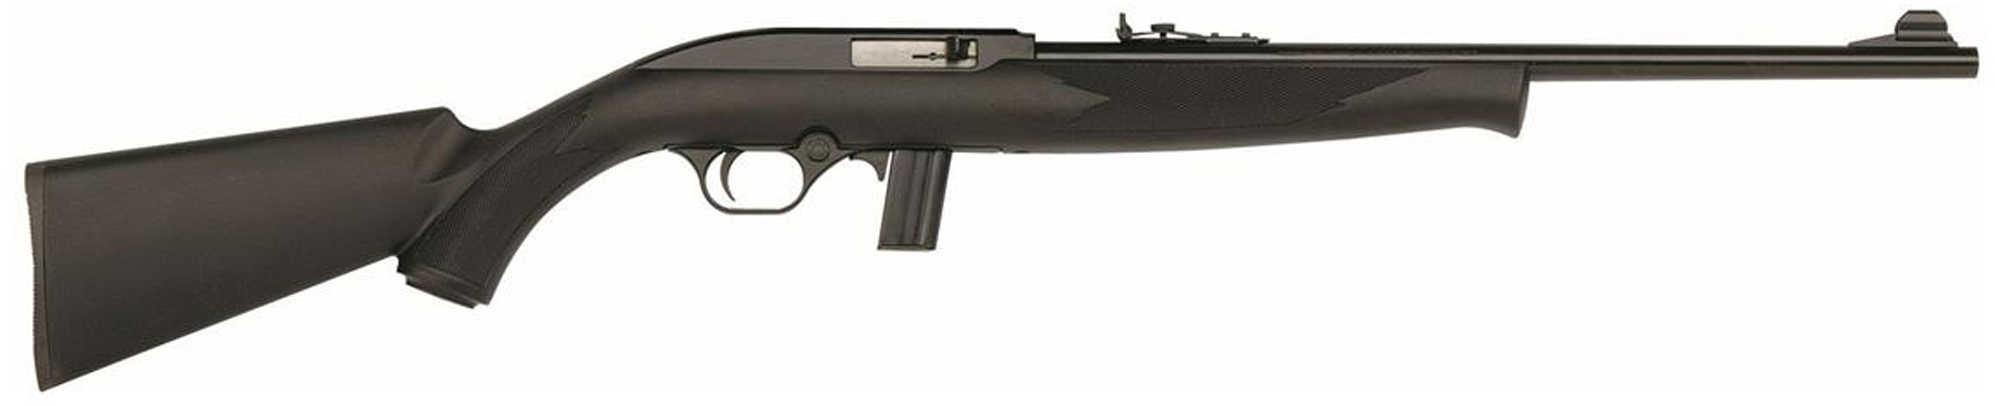 "Mossberg 702 Plinkster 22 Long Rifle 18"" Barrel 10 Round Blued Synthetic Bantam Semi Automatic Rifle 37000"